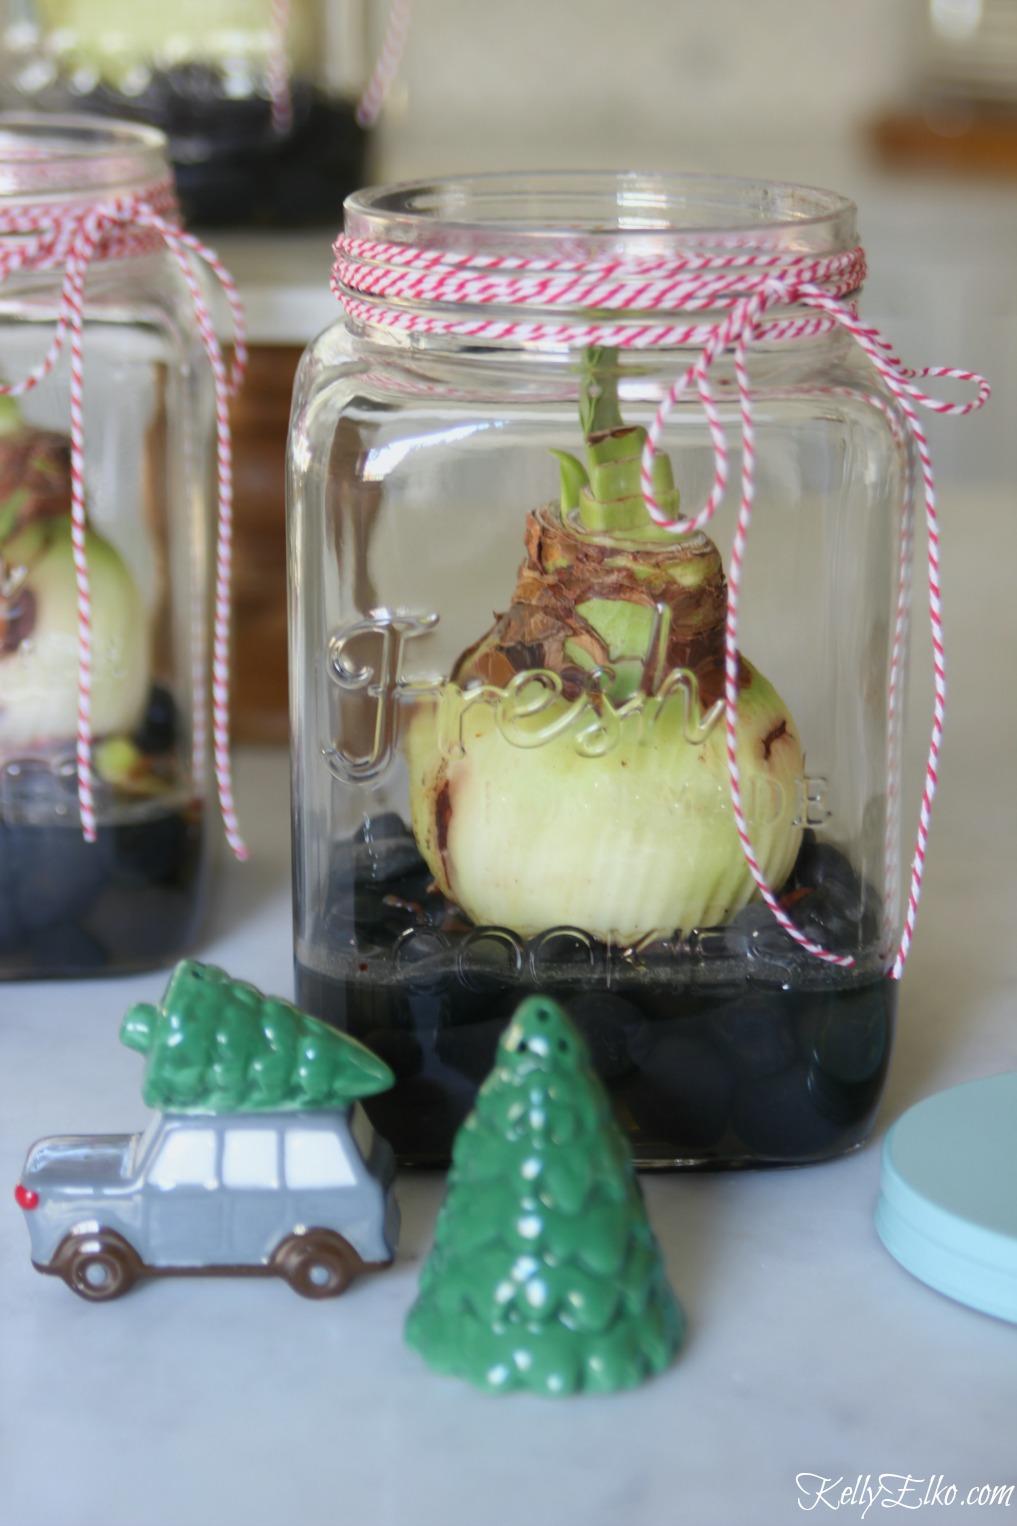 I love this Amaryllis bulb in a jar - make a fun Christmas gift kellyelko.com